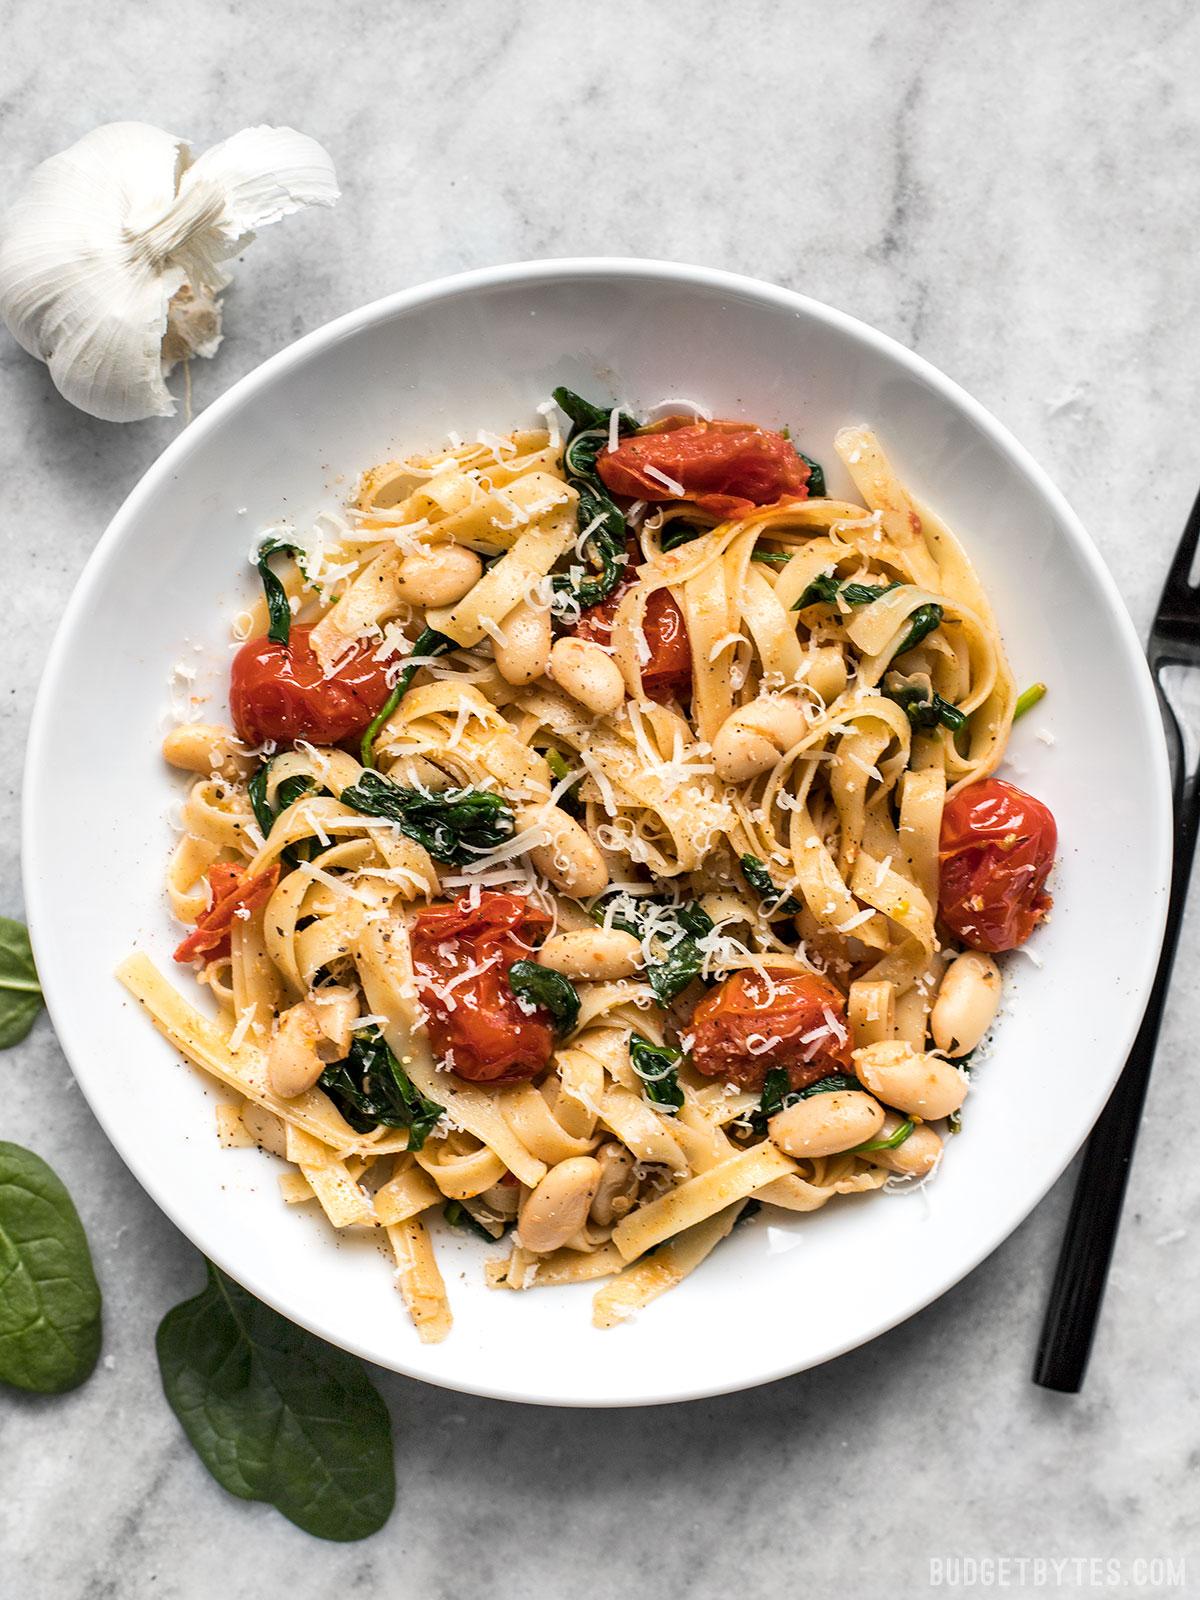 https://www.budgetbytes.com/2010/06/tuscan-white-bean-pasta/